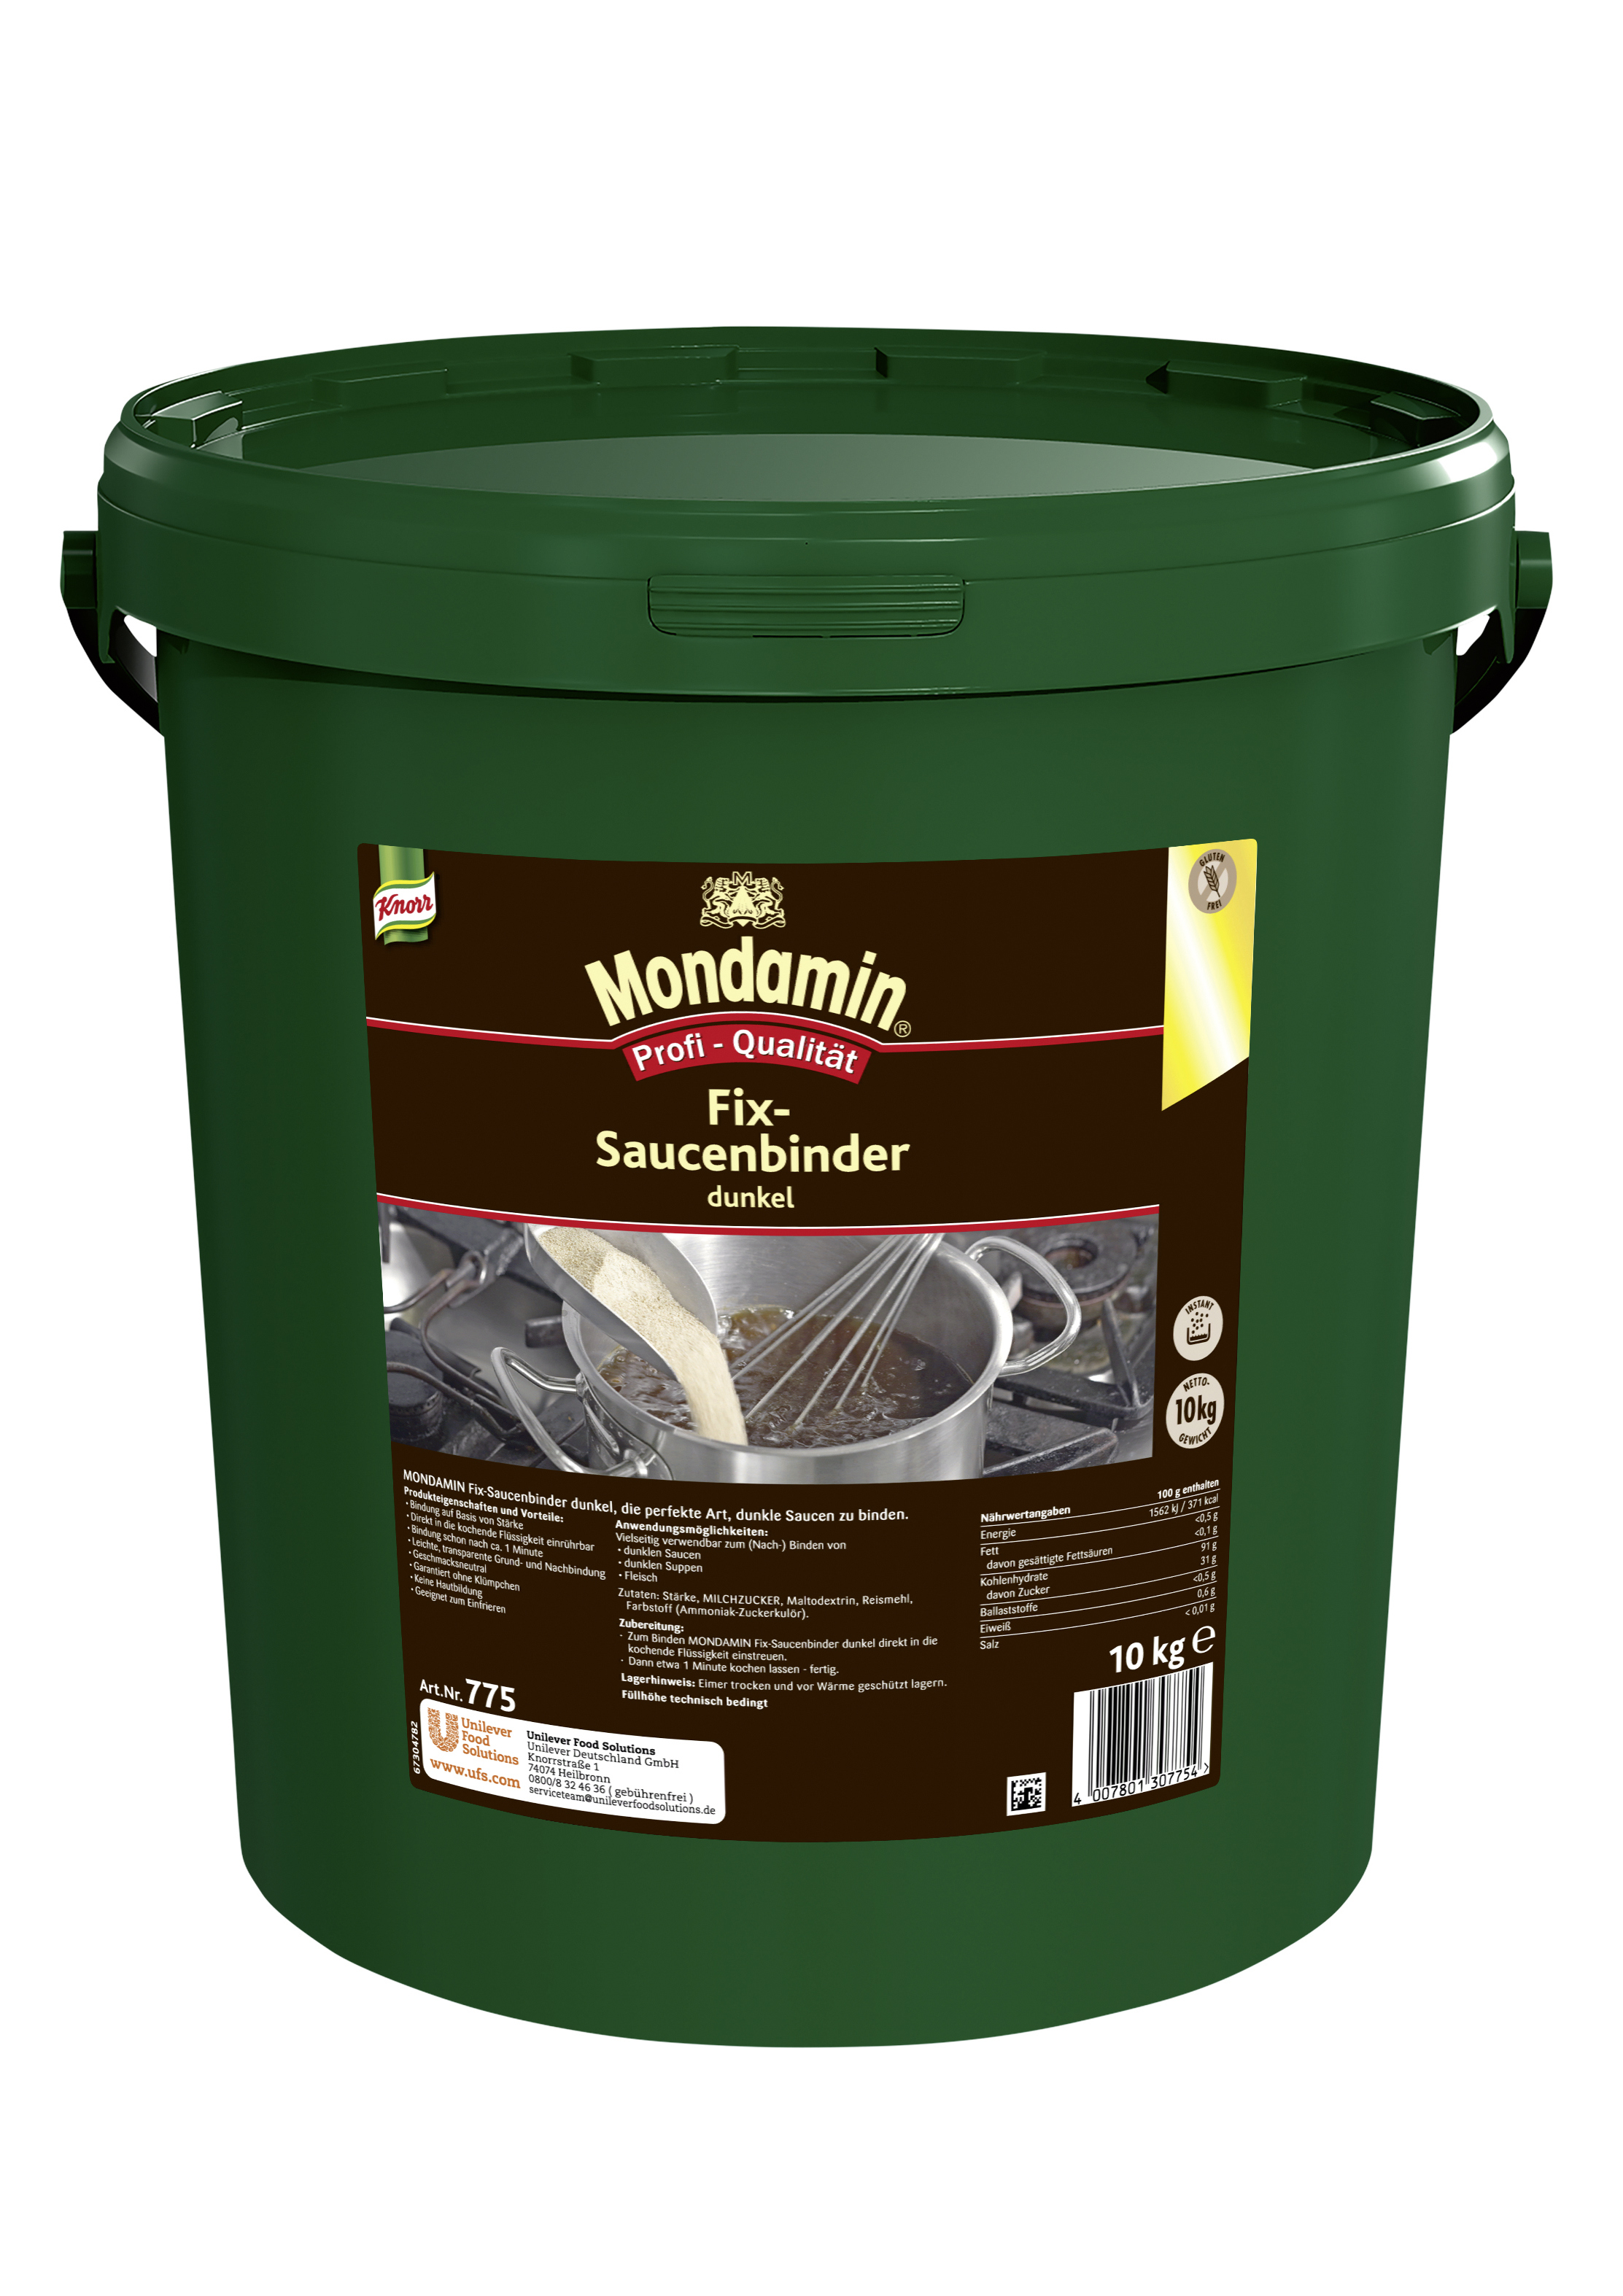 MONDAMIN Fix Saucenbinder dunkel 10 kg